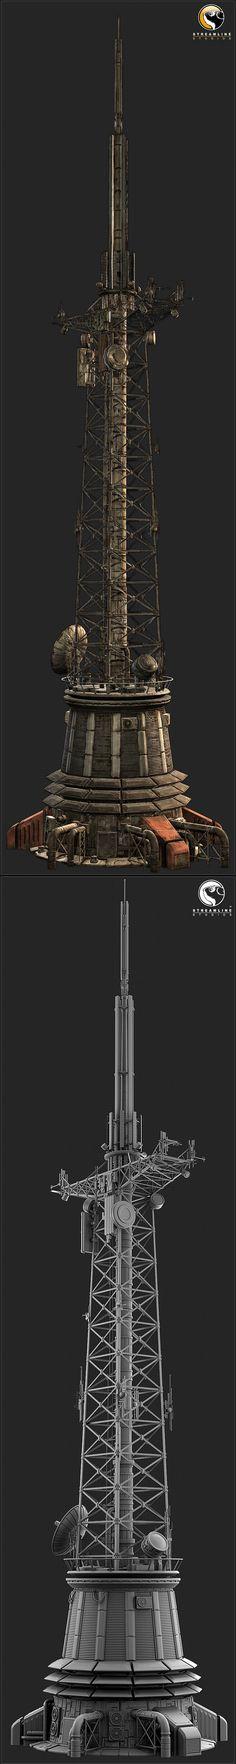 tower_ter.jpg (800×5981)